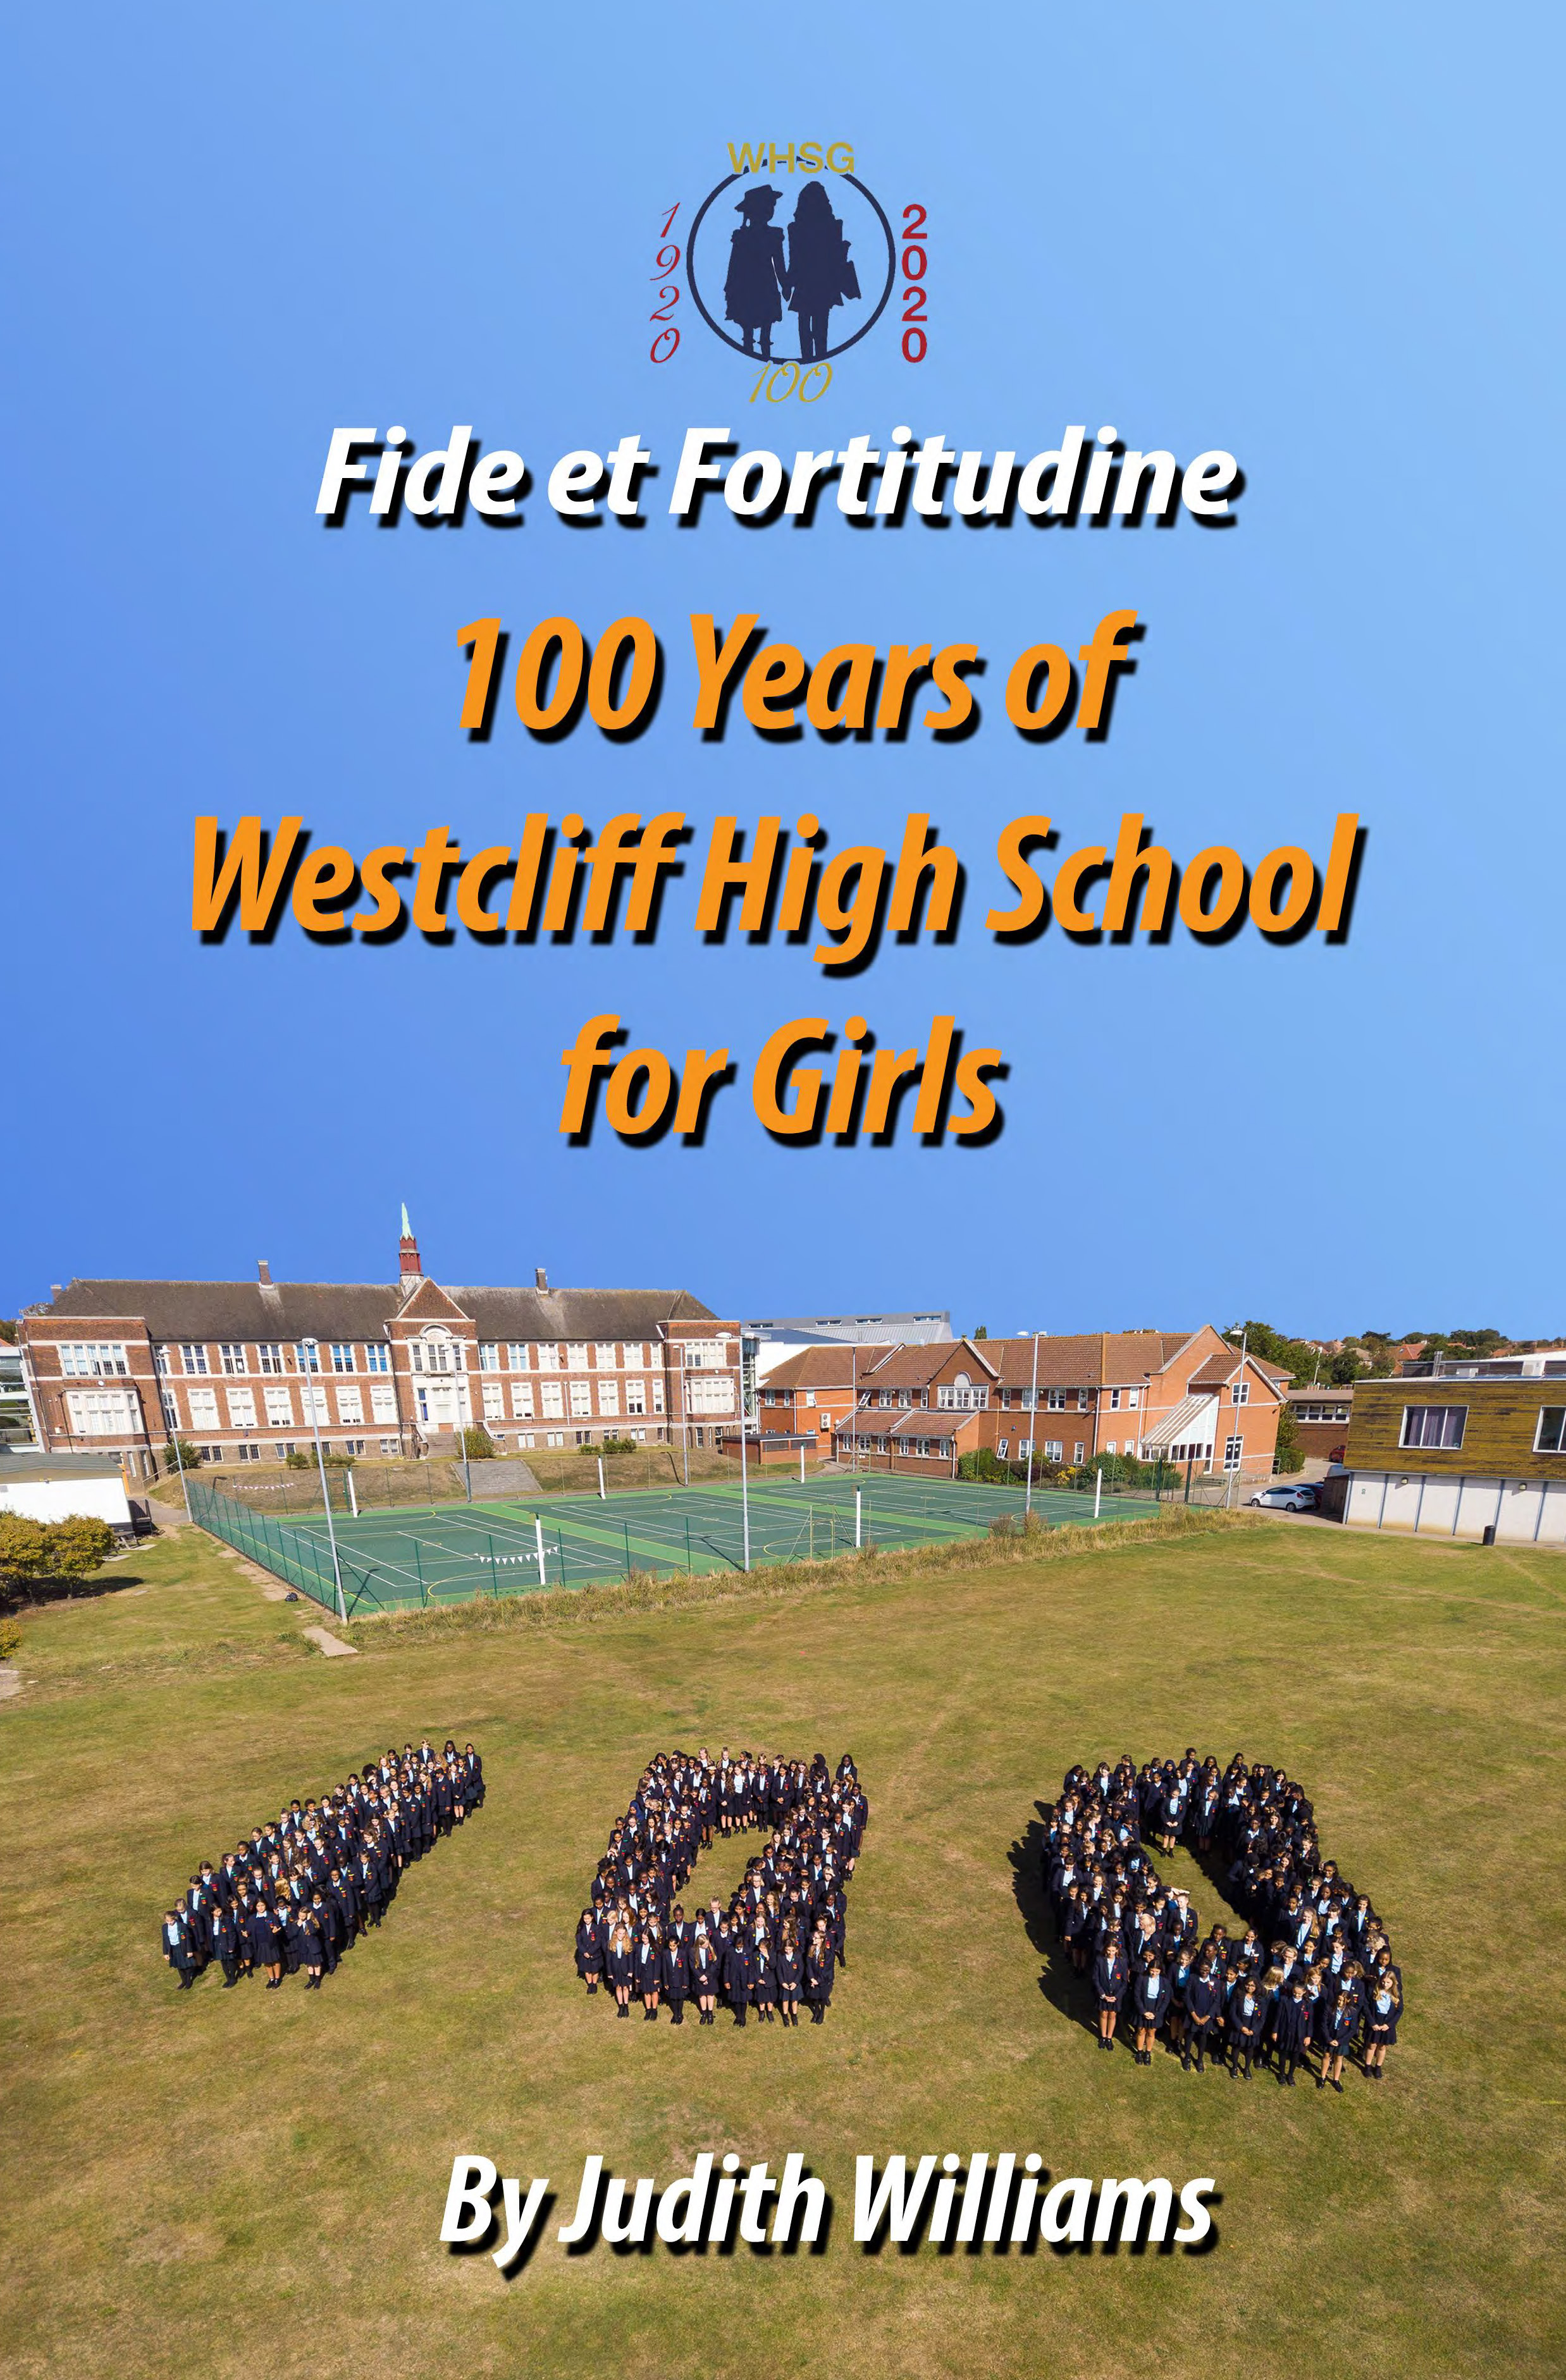 Fide et Fortitudine: 100 Years of Westcliff High School for Girls